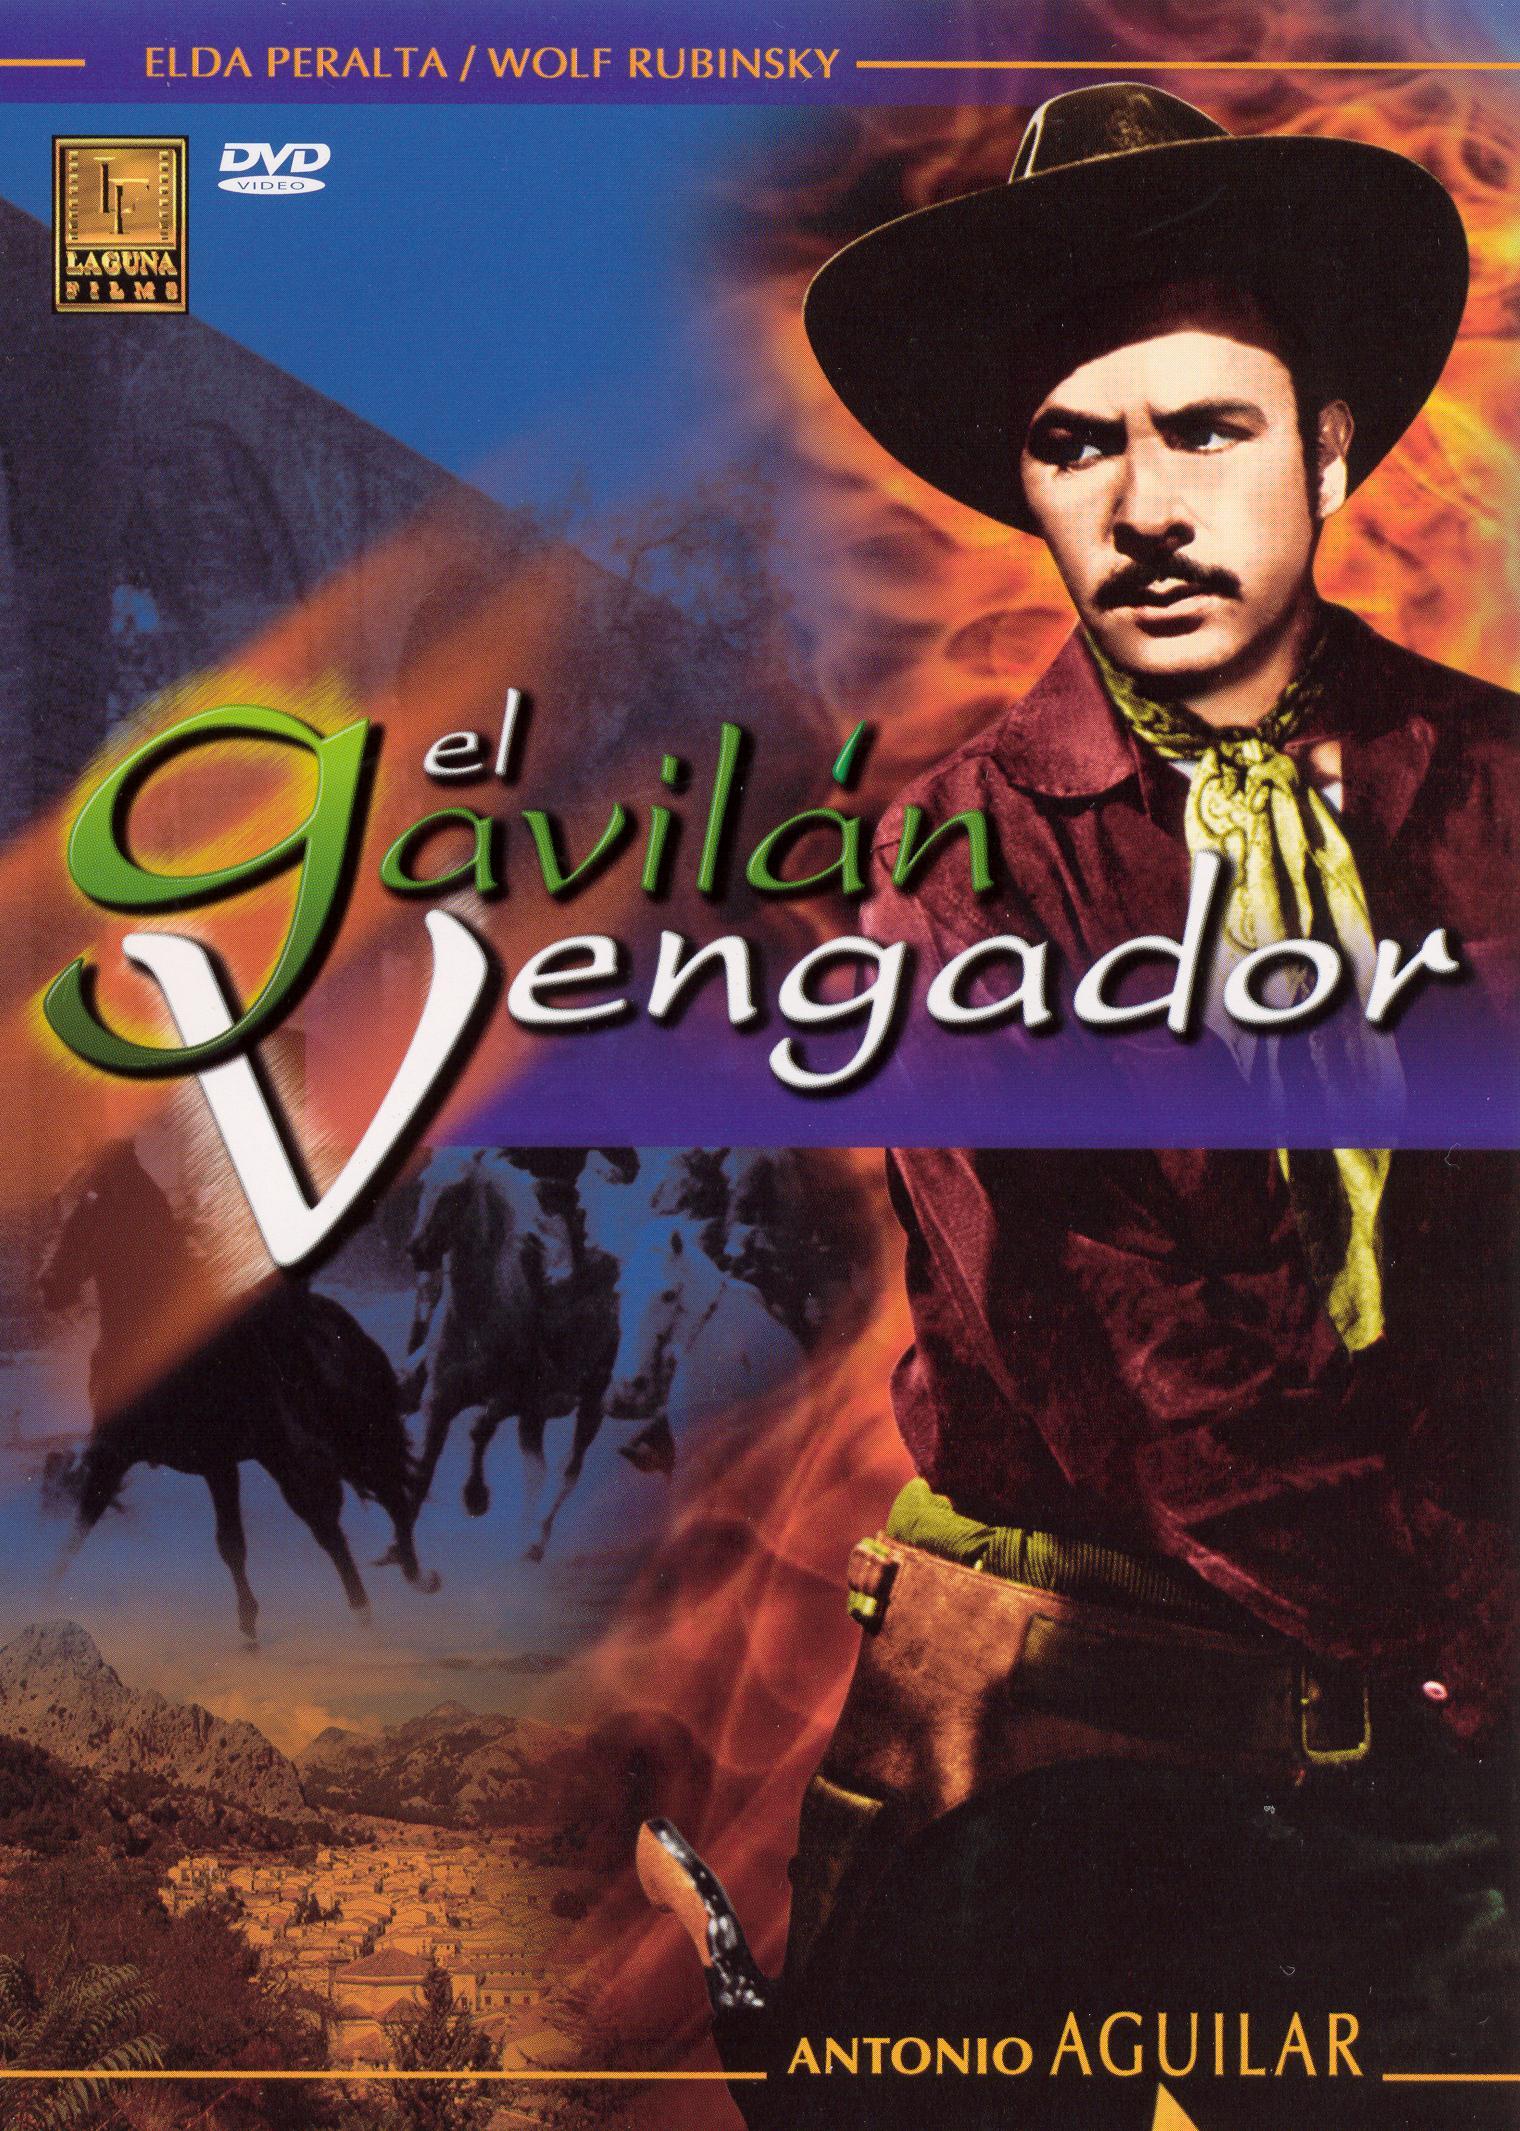 El Gavilan Vengador